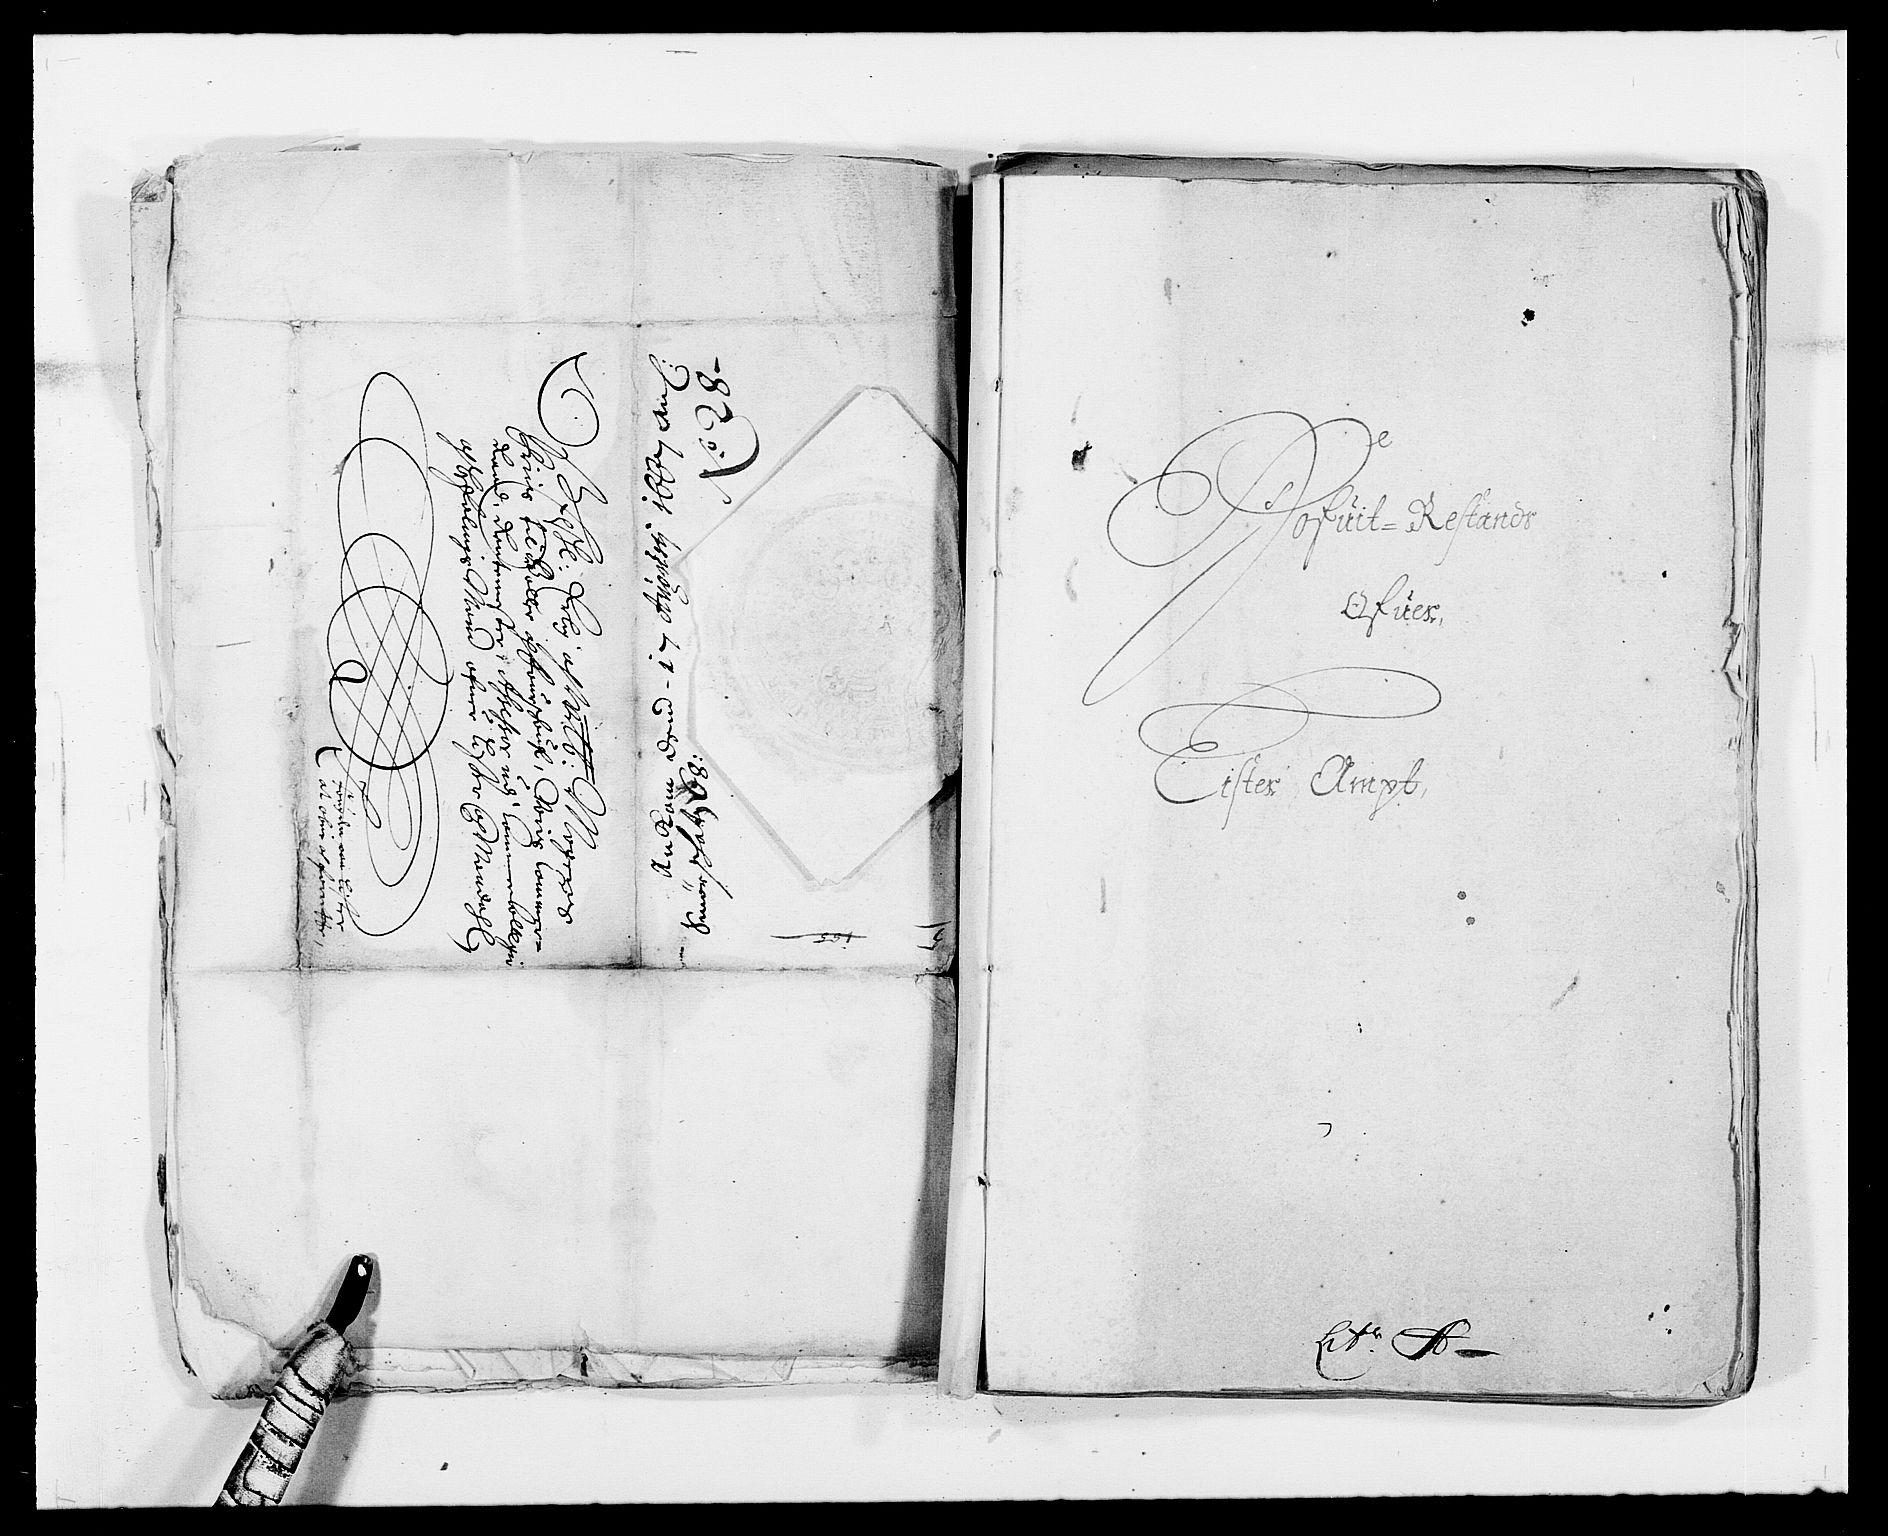 RA, Rentekammeret inntil 1814, Reviderte regnskaper, Fogderegnskap, R41/L2527: Fogderegnskap Lista, 1672, s. 304